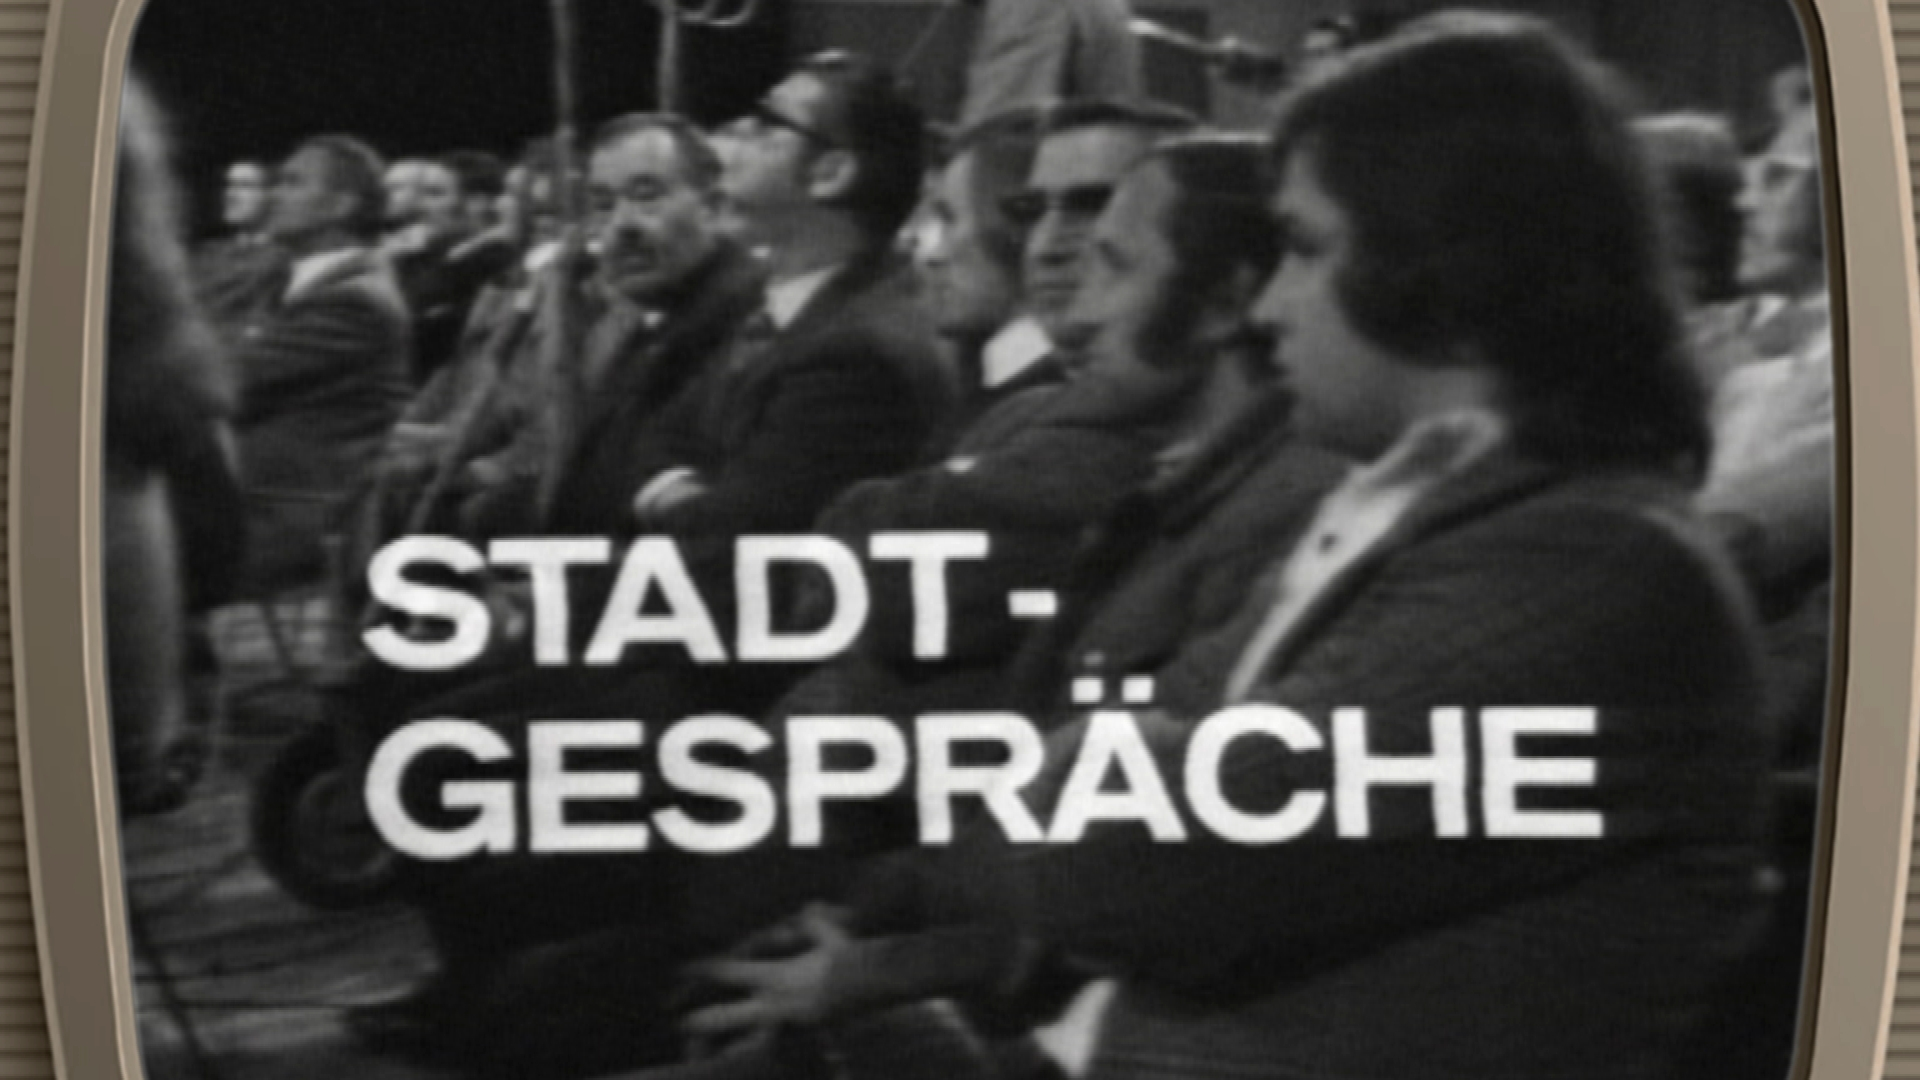 6 Fernsehn zum Gernsehn F01 FINAL 200426 Copy 01